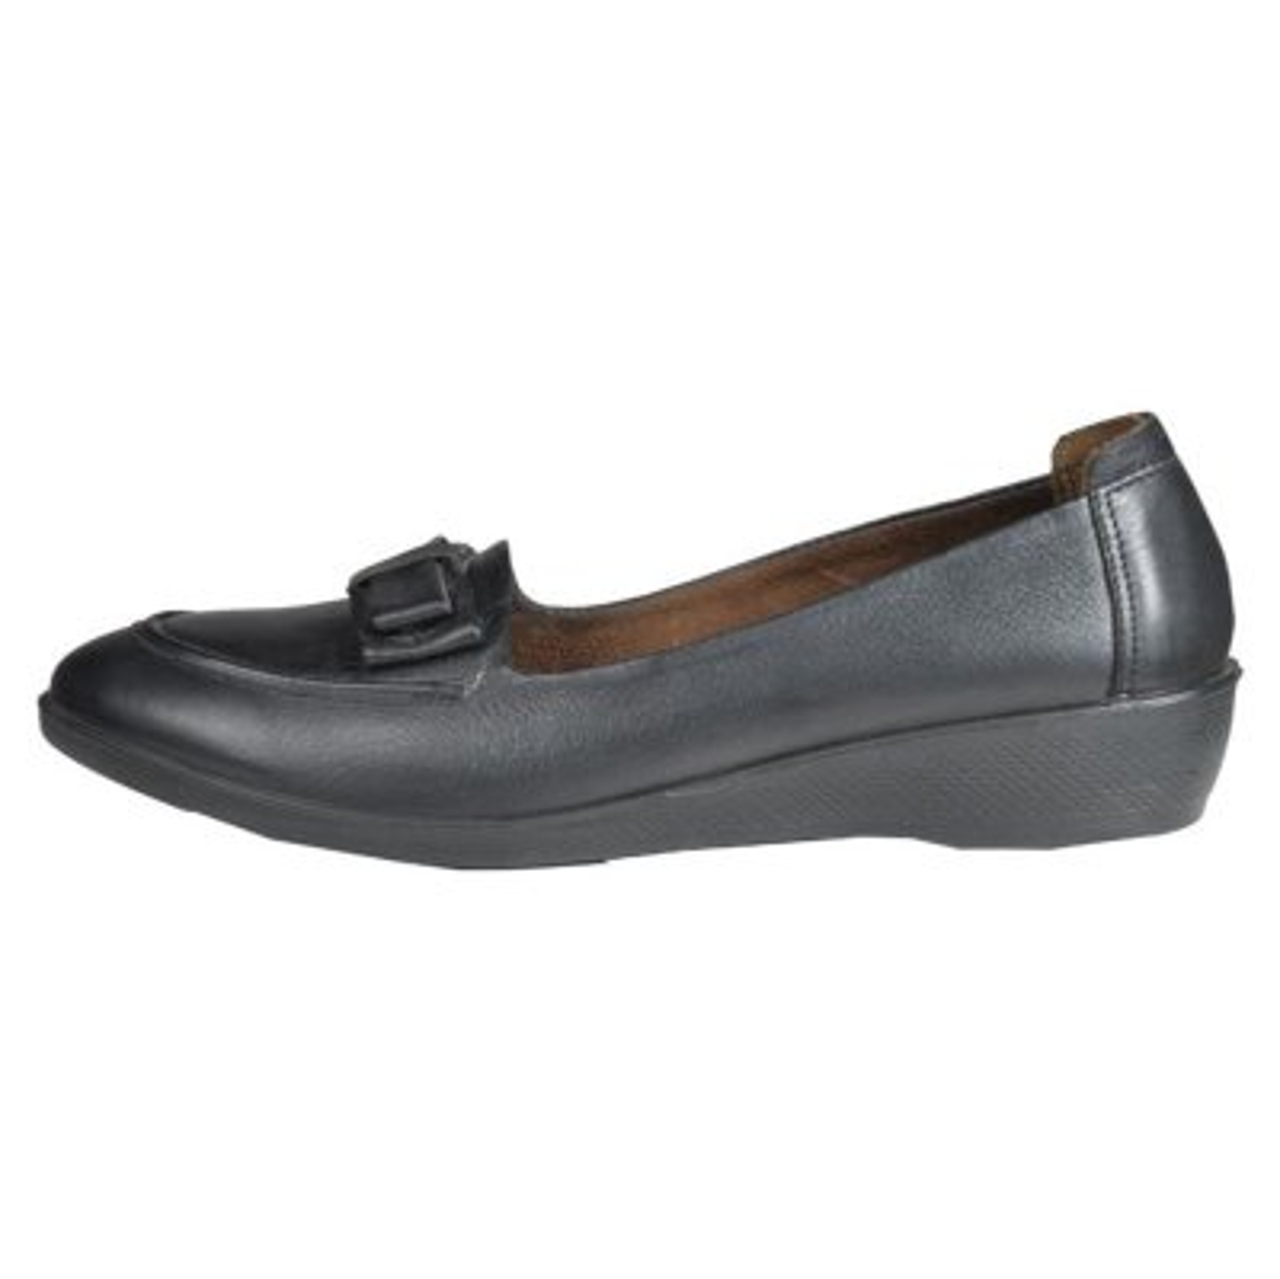 تصویر کفش زنانه کد 5007